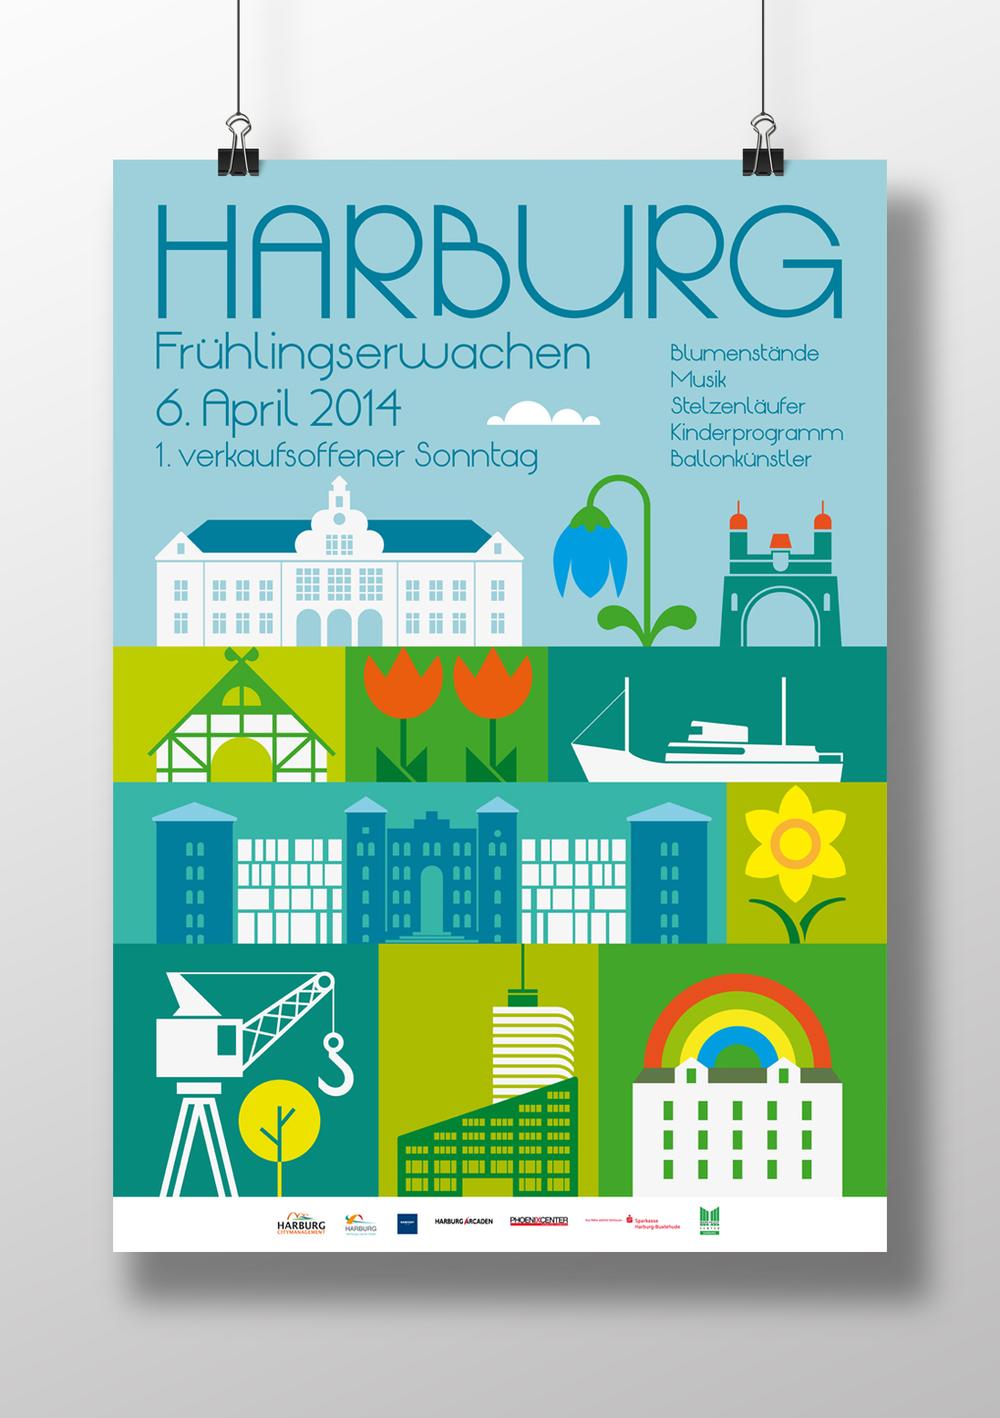 poster_Harburg_01_mockup.png